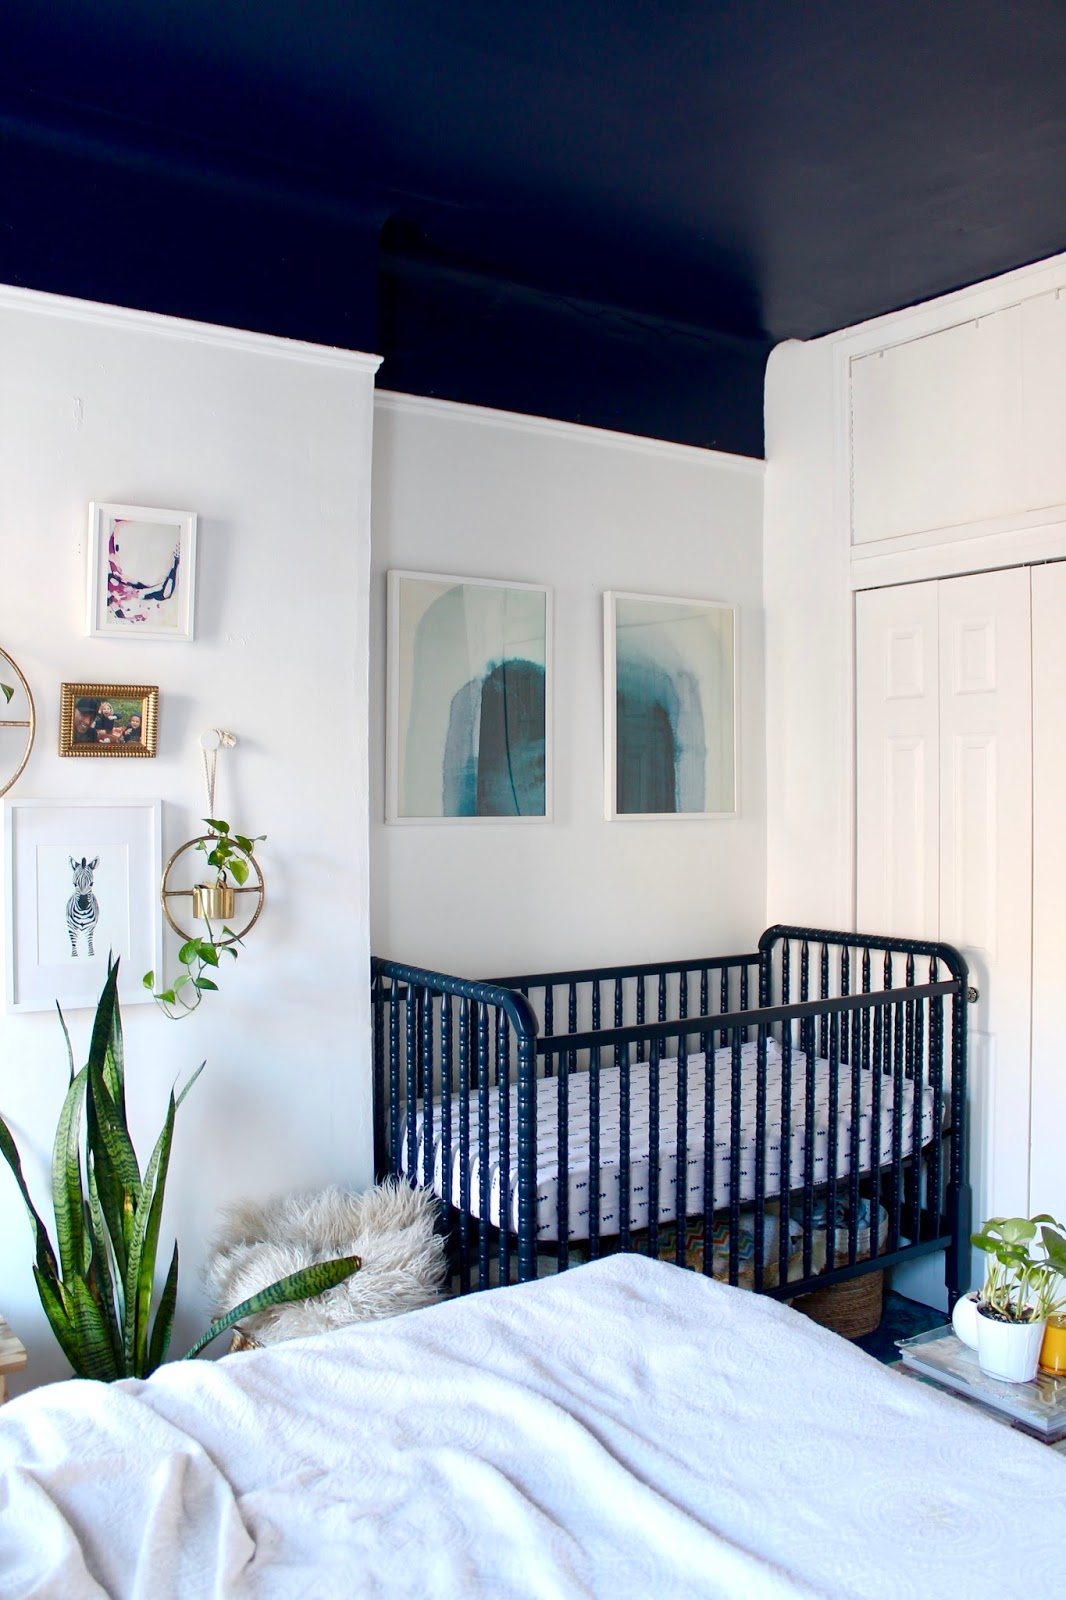 Boho shared master bedroom x nursery tfdiaries by megan zietz Master bedroom shared with nursery